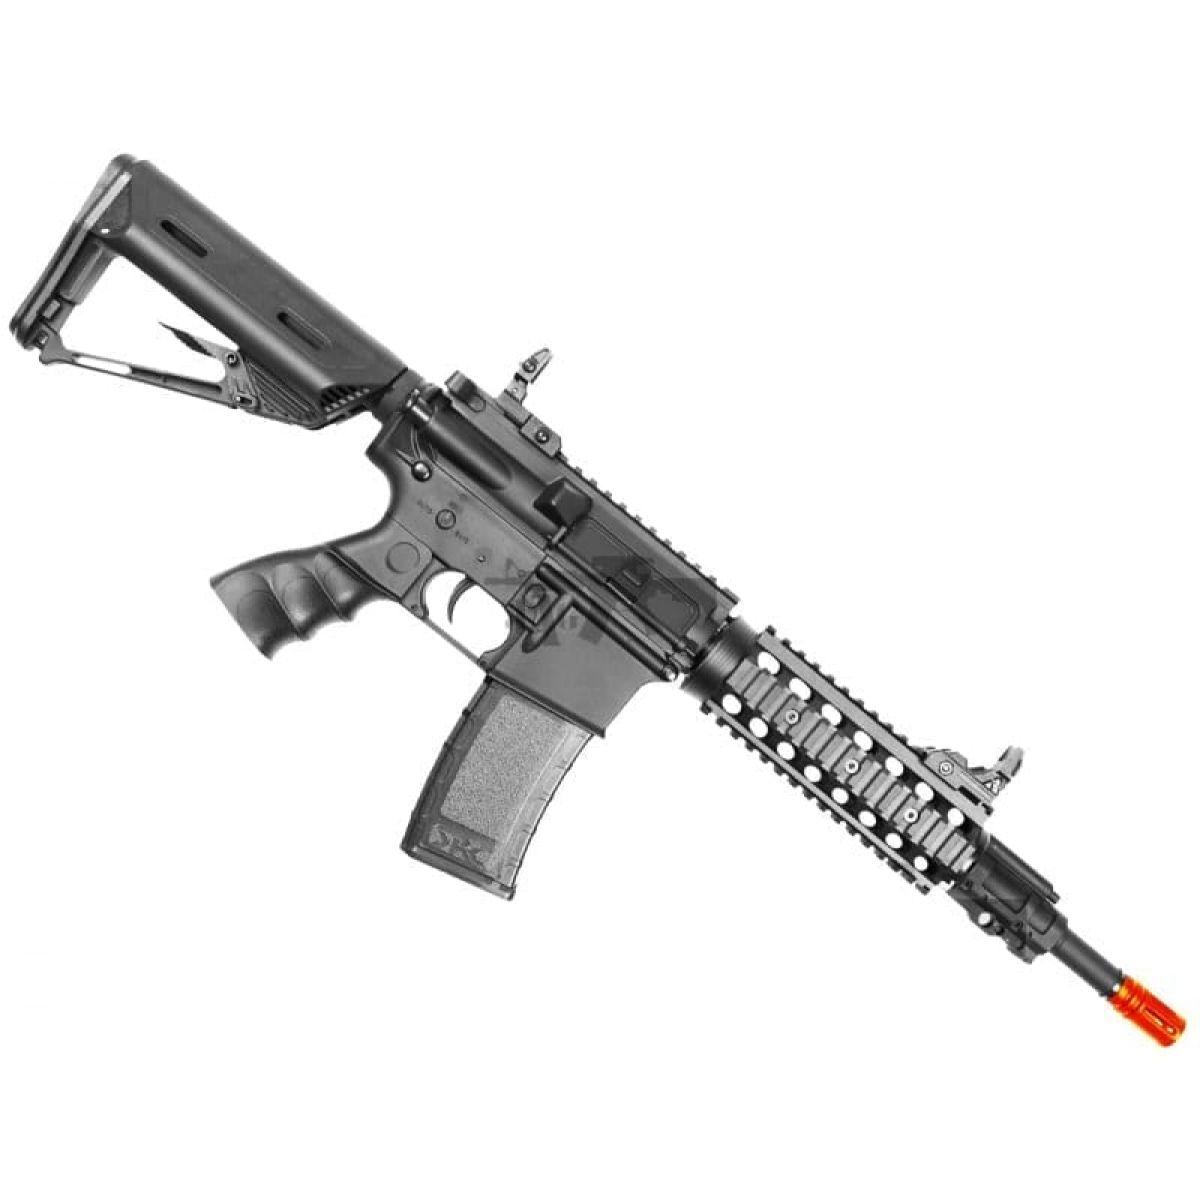 BULLDOG ST BETA AIRSOFT ELECTRIC RIFLE GUN BEST NEW CQB